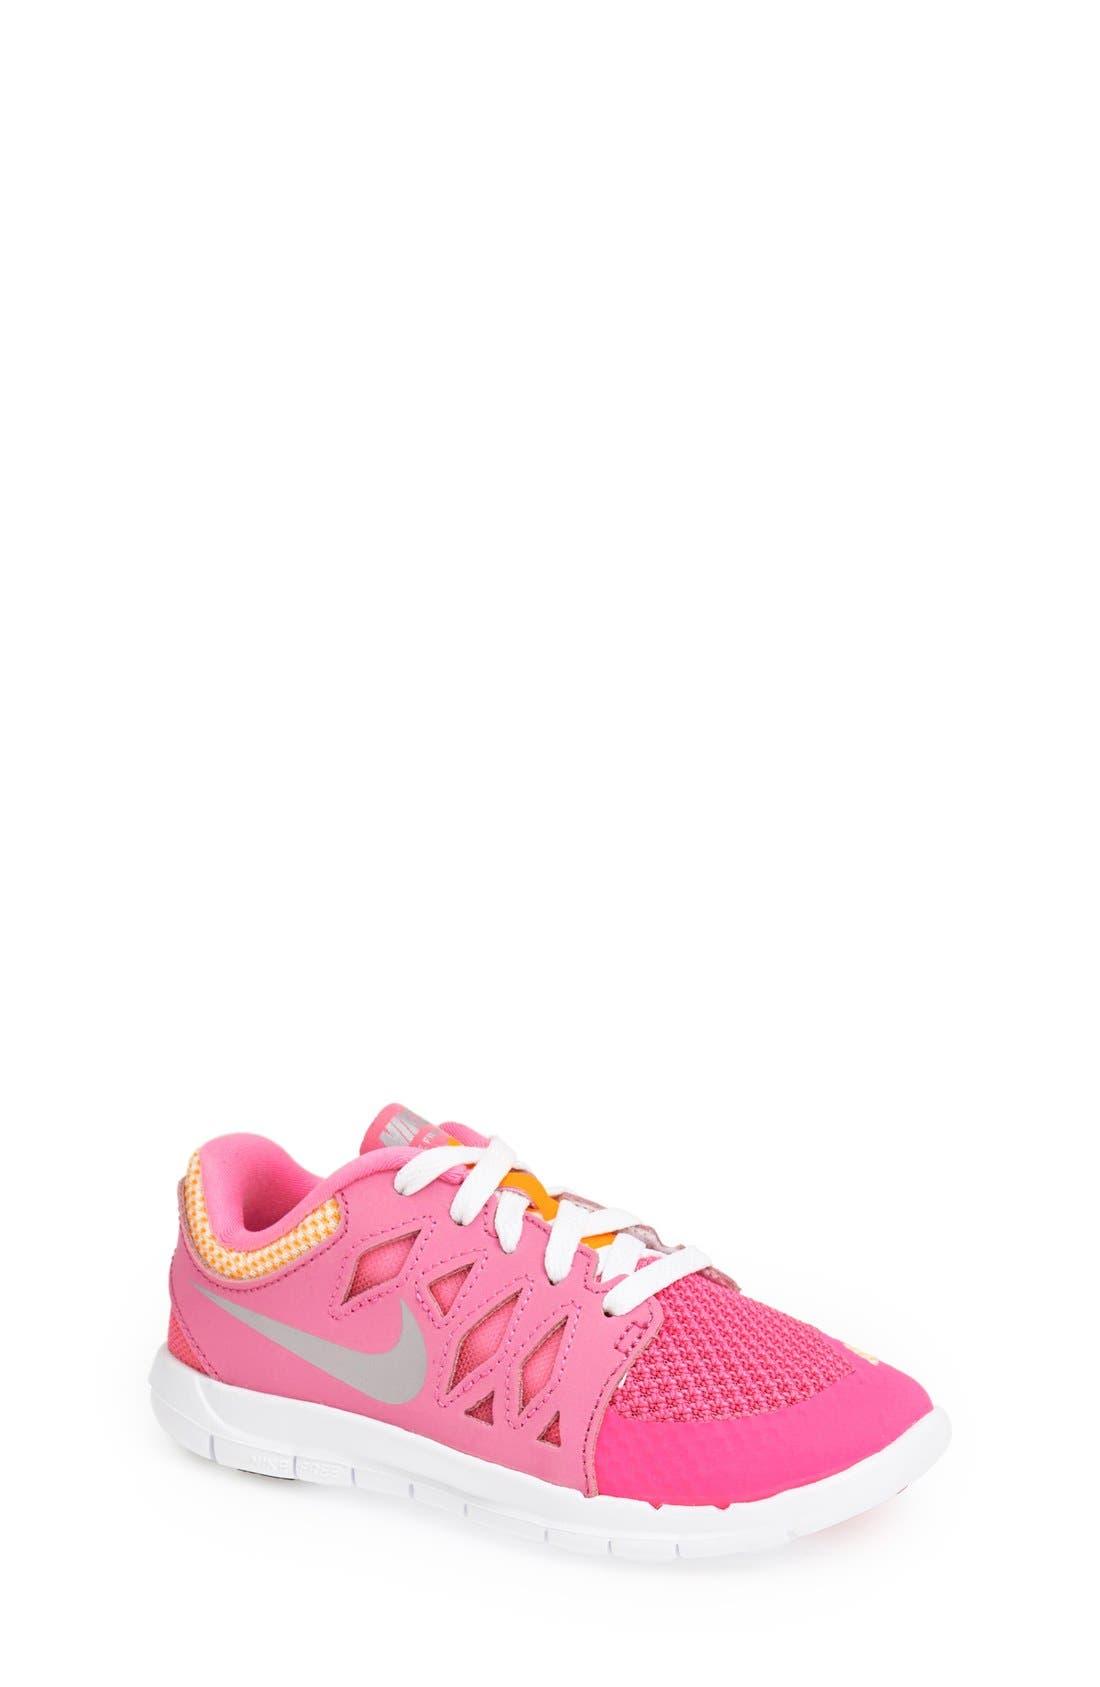 Alternate Image 1 Selected - Nike 'Free 5.0' Running Shoe (Toddler & Little Kid)